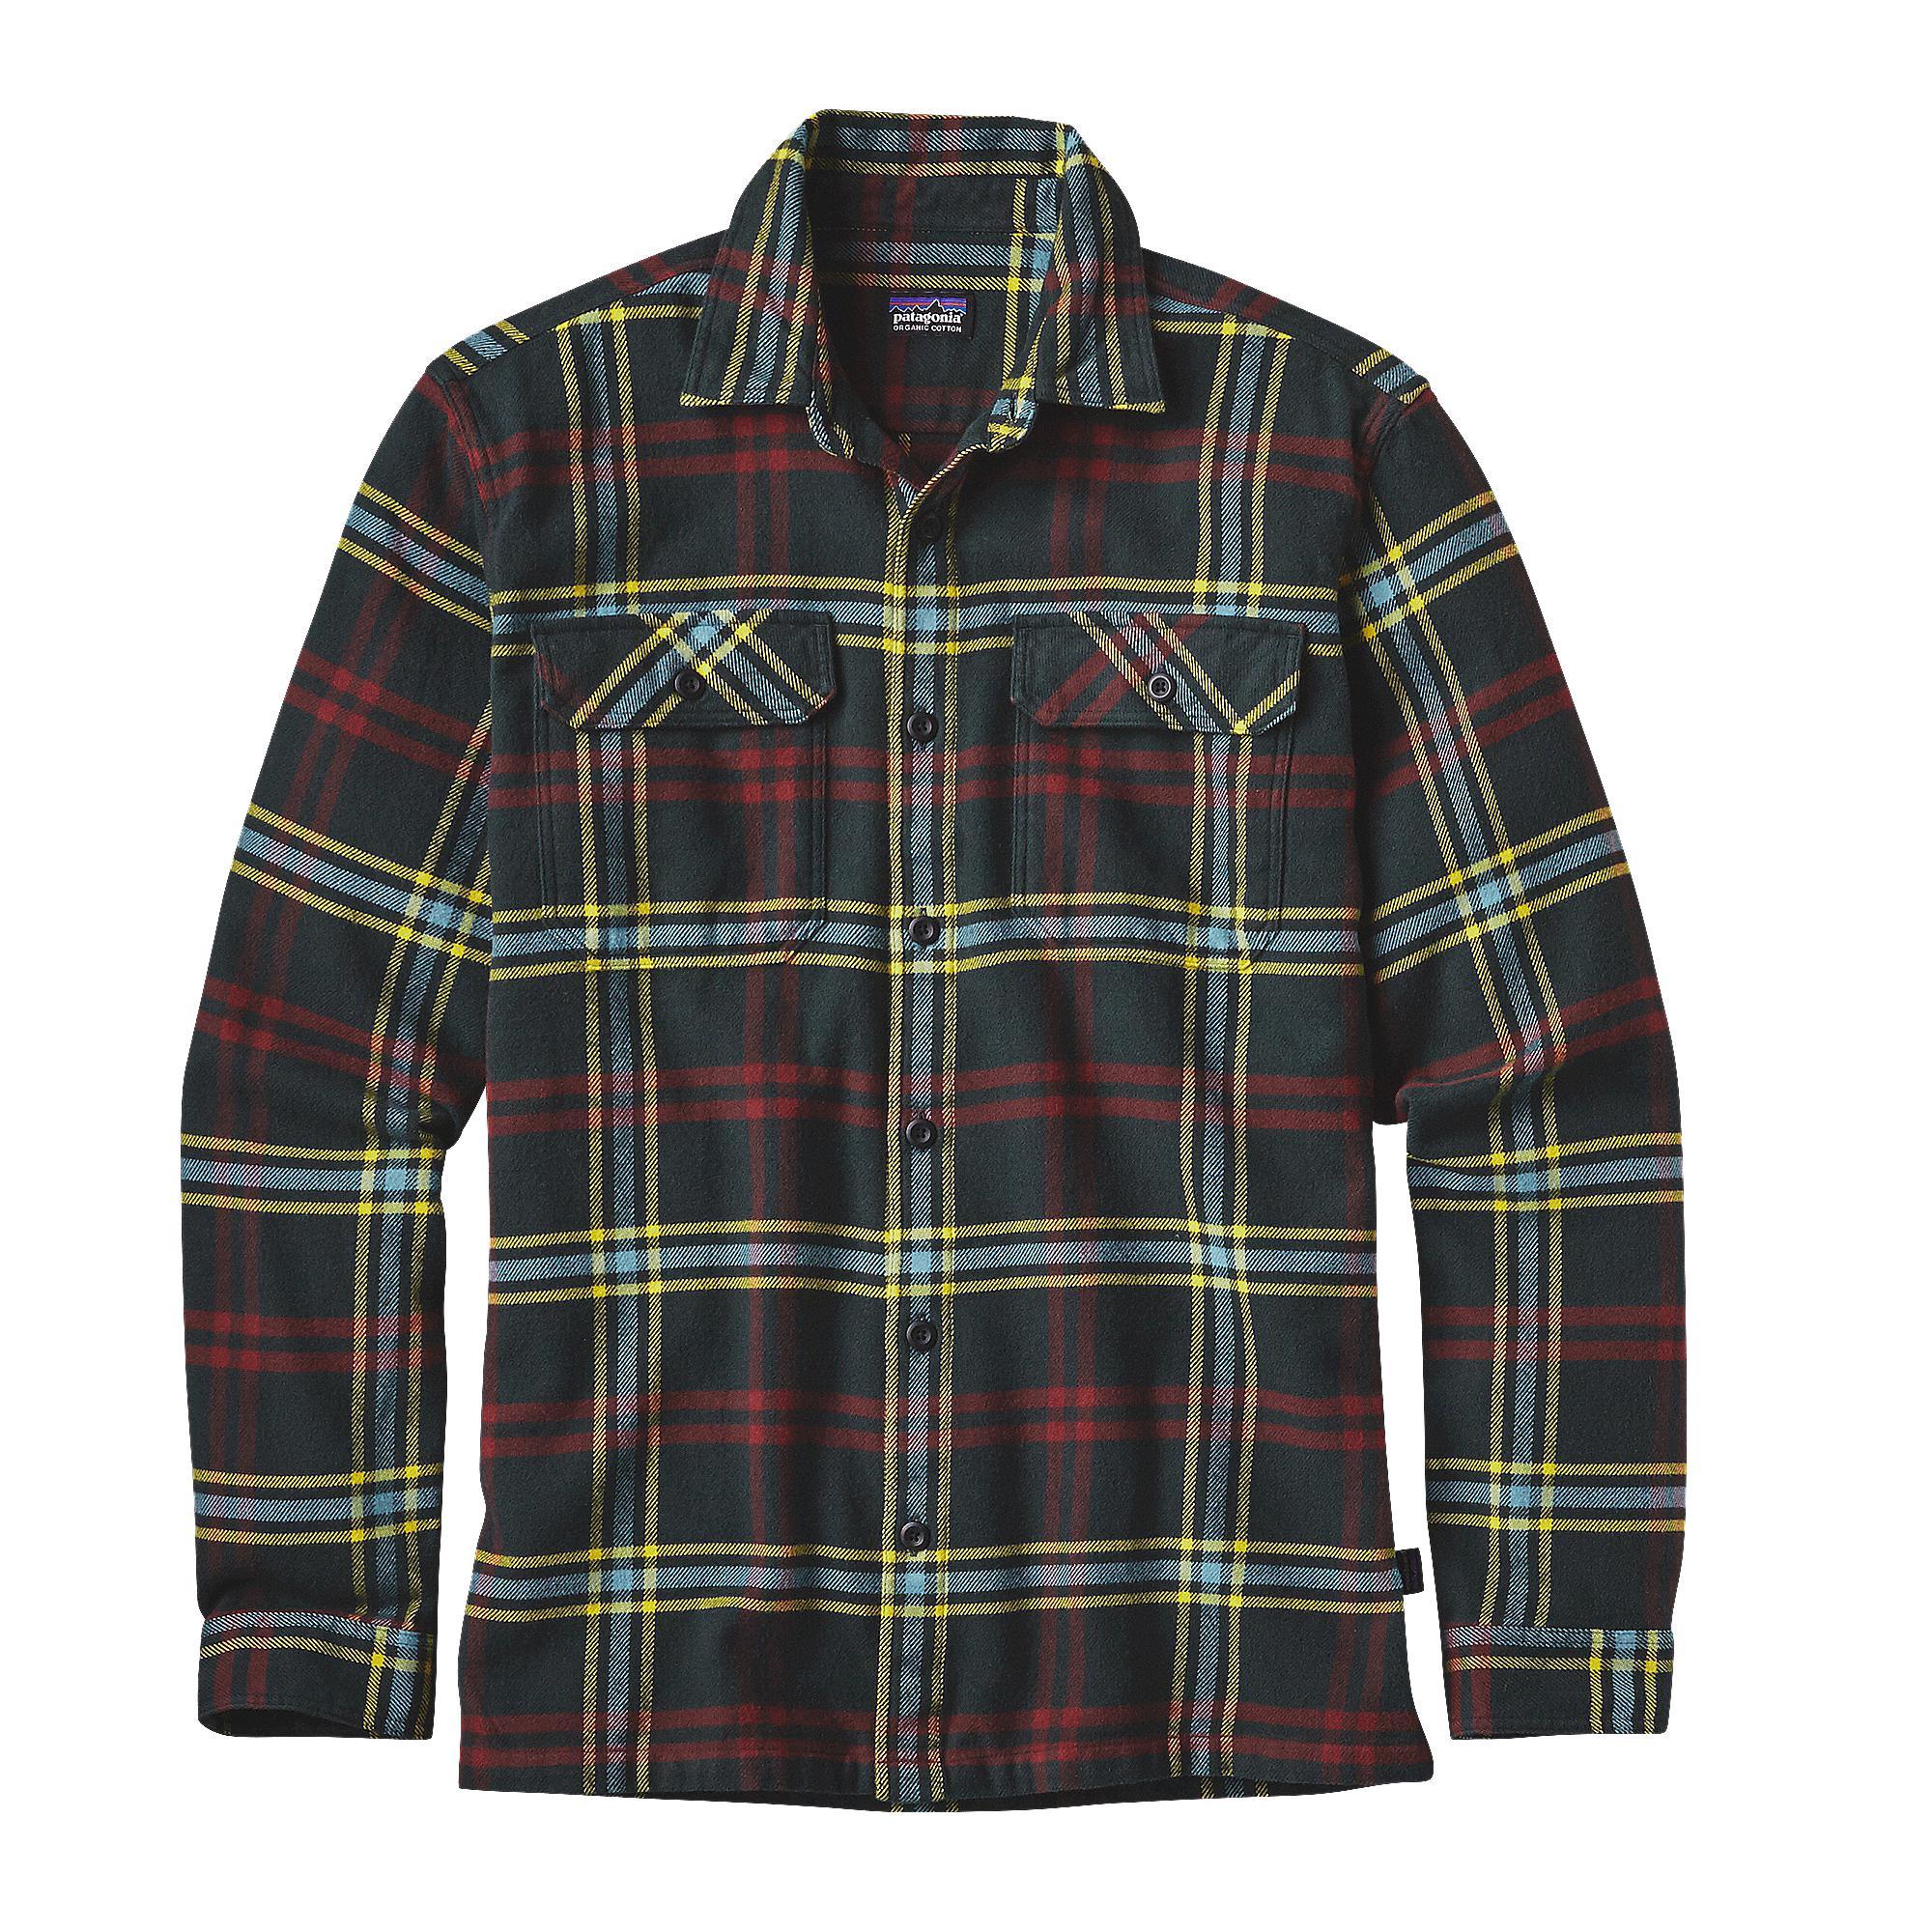 a basso prezzo f50c2 be8d3 Patagonia Camicia Uomo Flanella M's Long-Sleeved Fjord Flannel Shirt